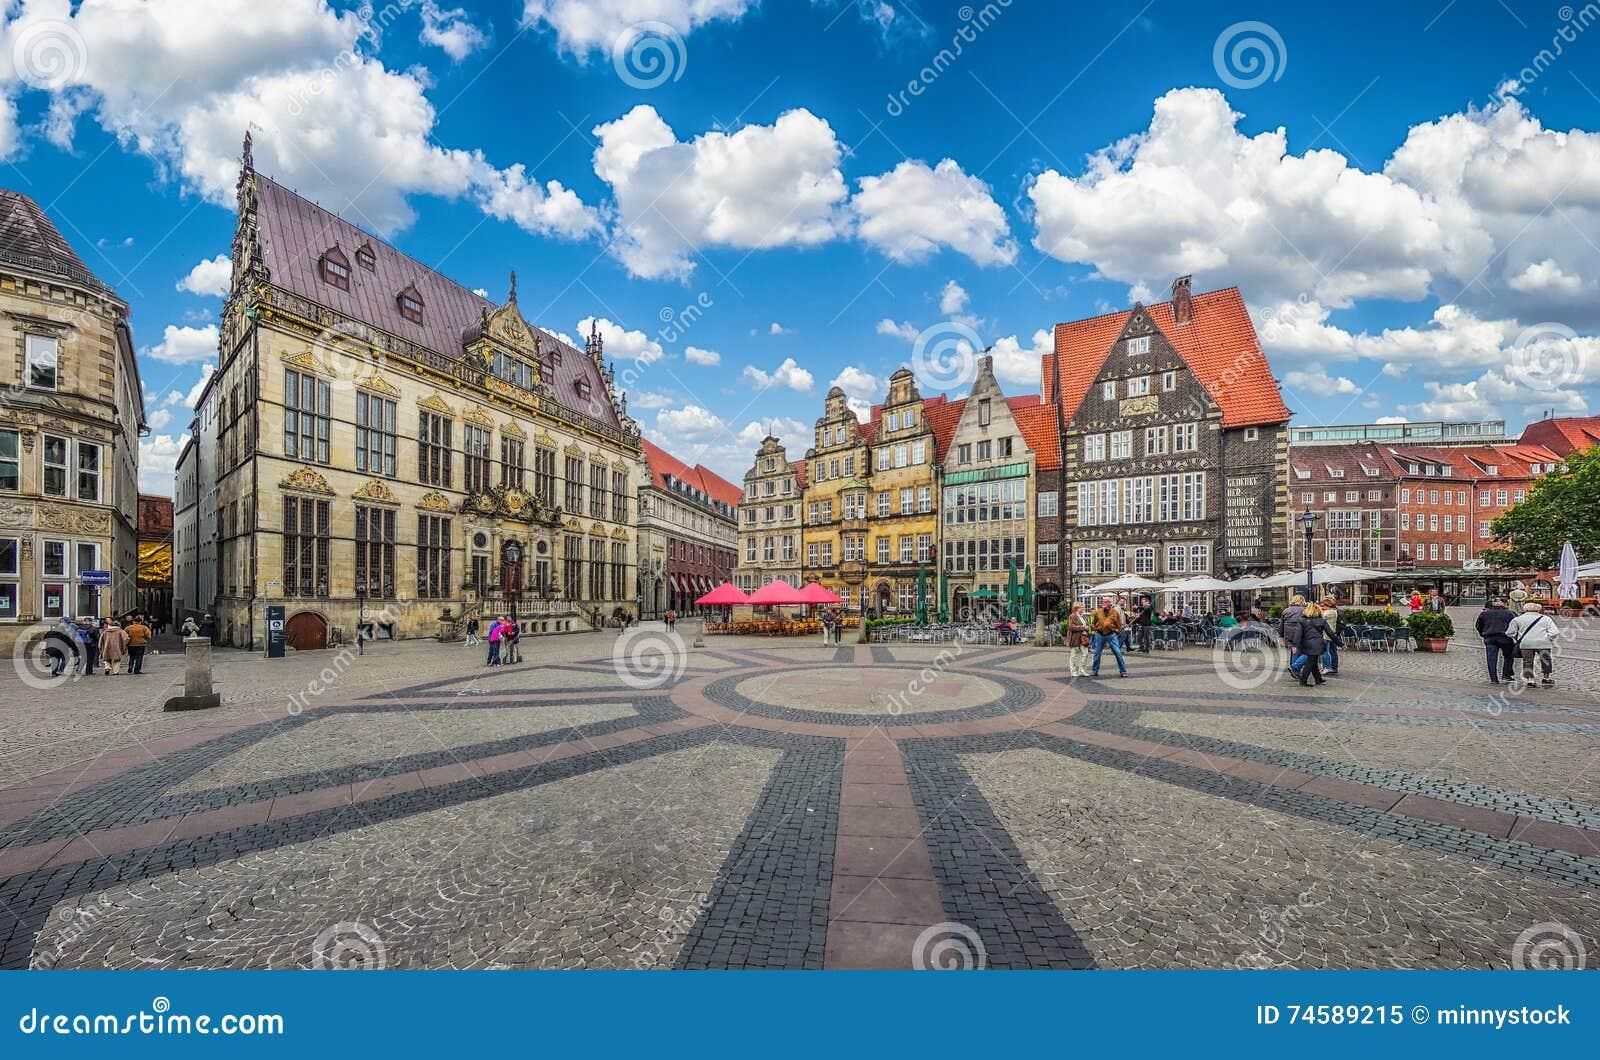 Historic Bremen Market Square in the Hanseatic City Bremen, Germany